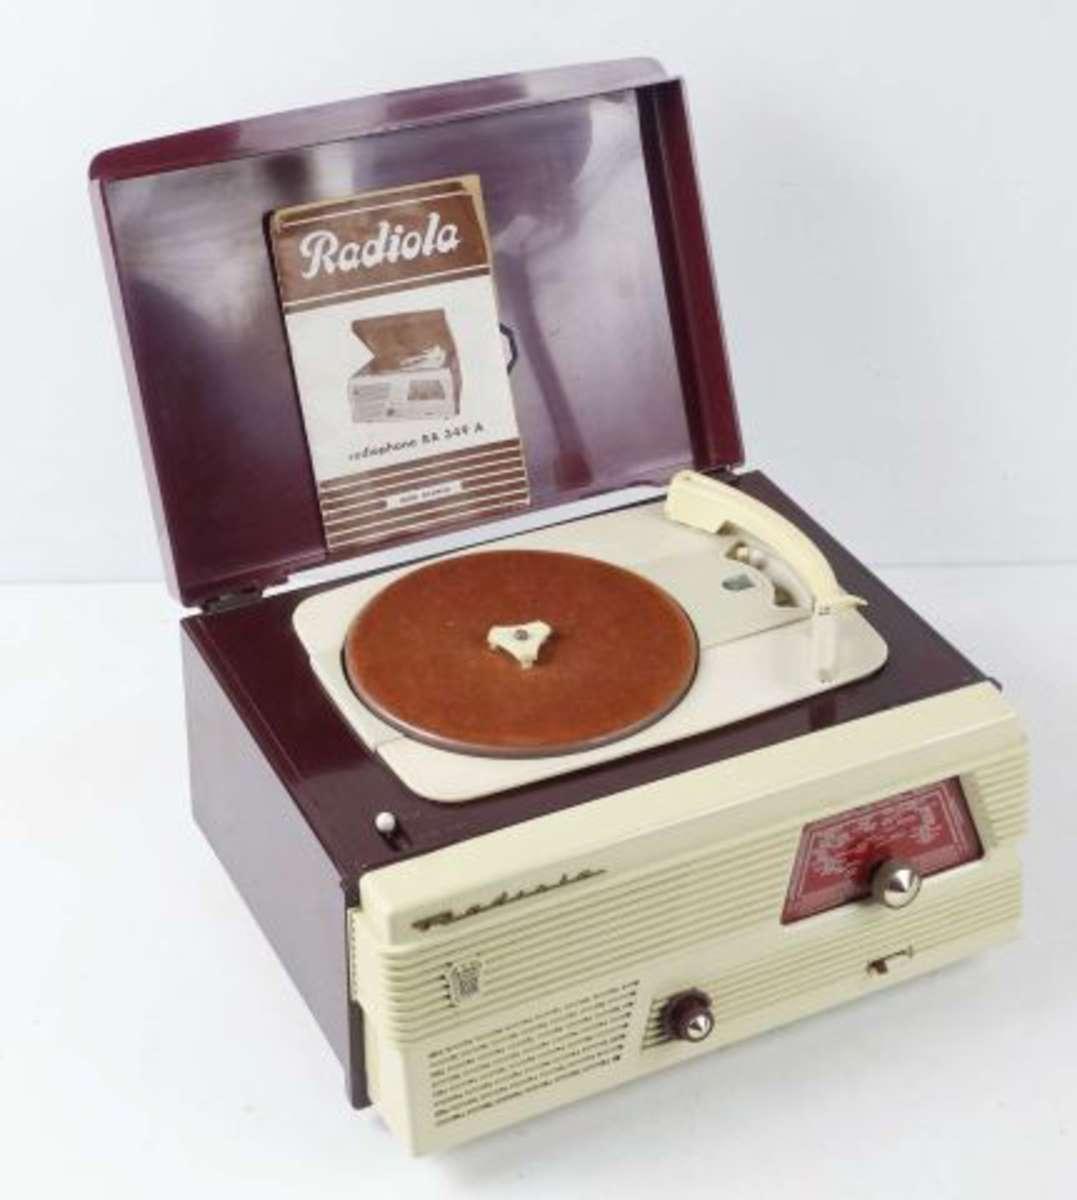 radiola poste radio tourne disque type ra349a en l 39 tat vente aux ench res. Black Bedroom Furniture Sets. Home Design Ideas